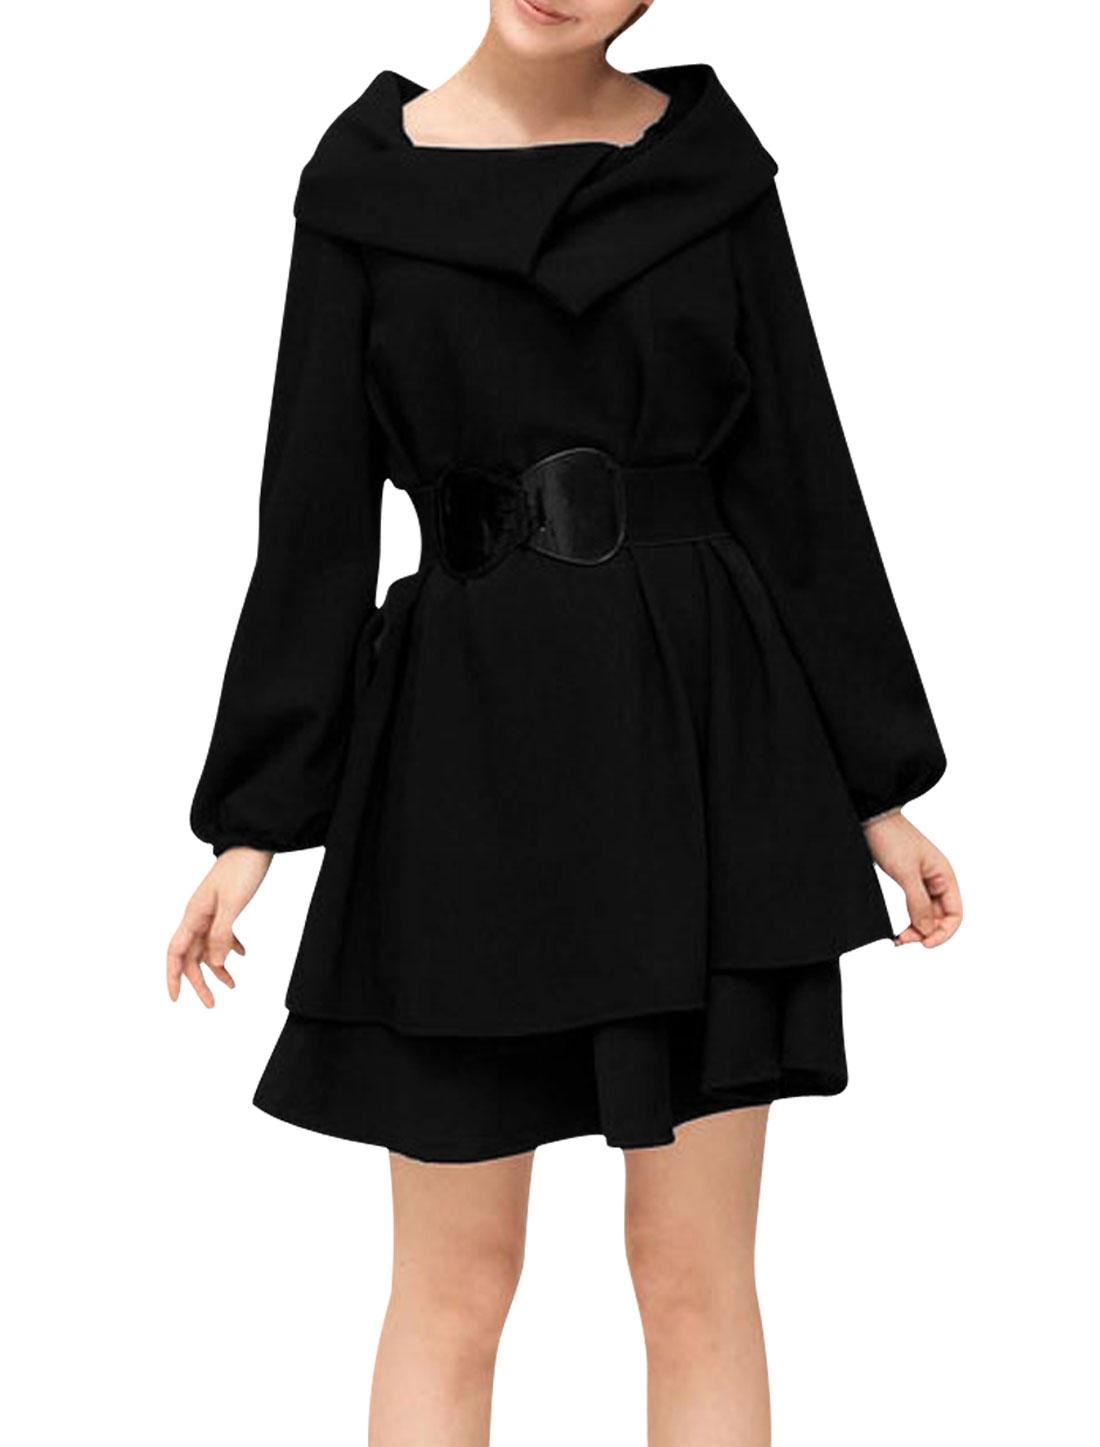 Ladies Boat Neck Lantern Sleeve Autumn Flare Hem Black Dress M